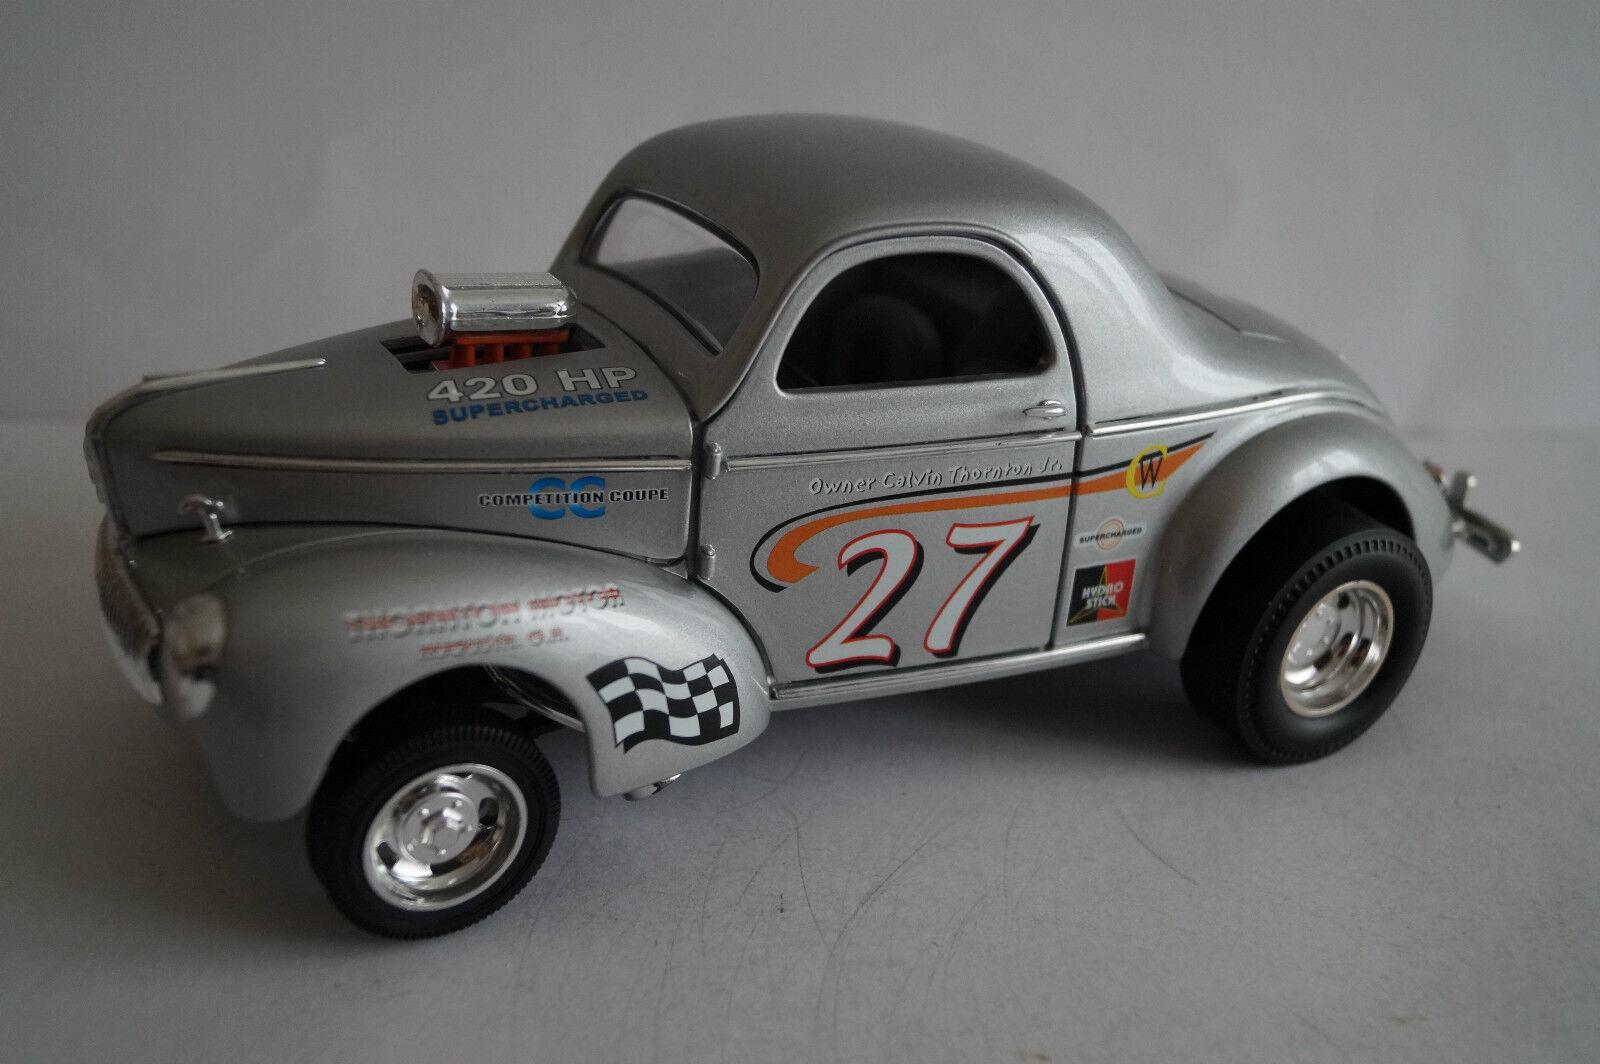 Road Signature Model Car 1 18 1941 Willys 420 HP NO 27